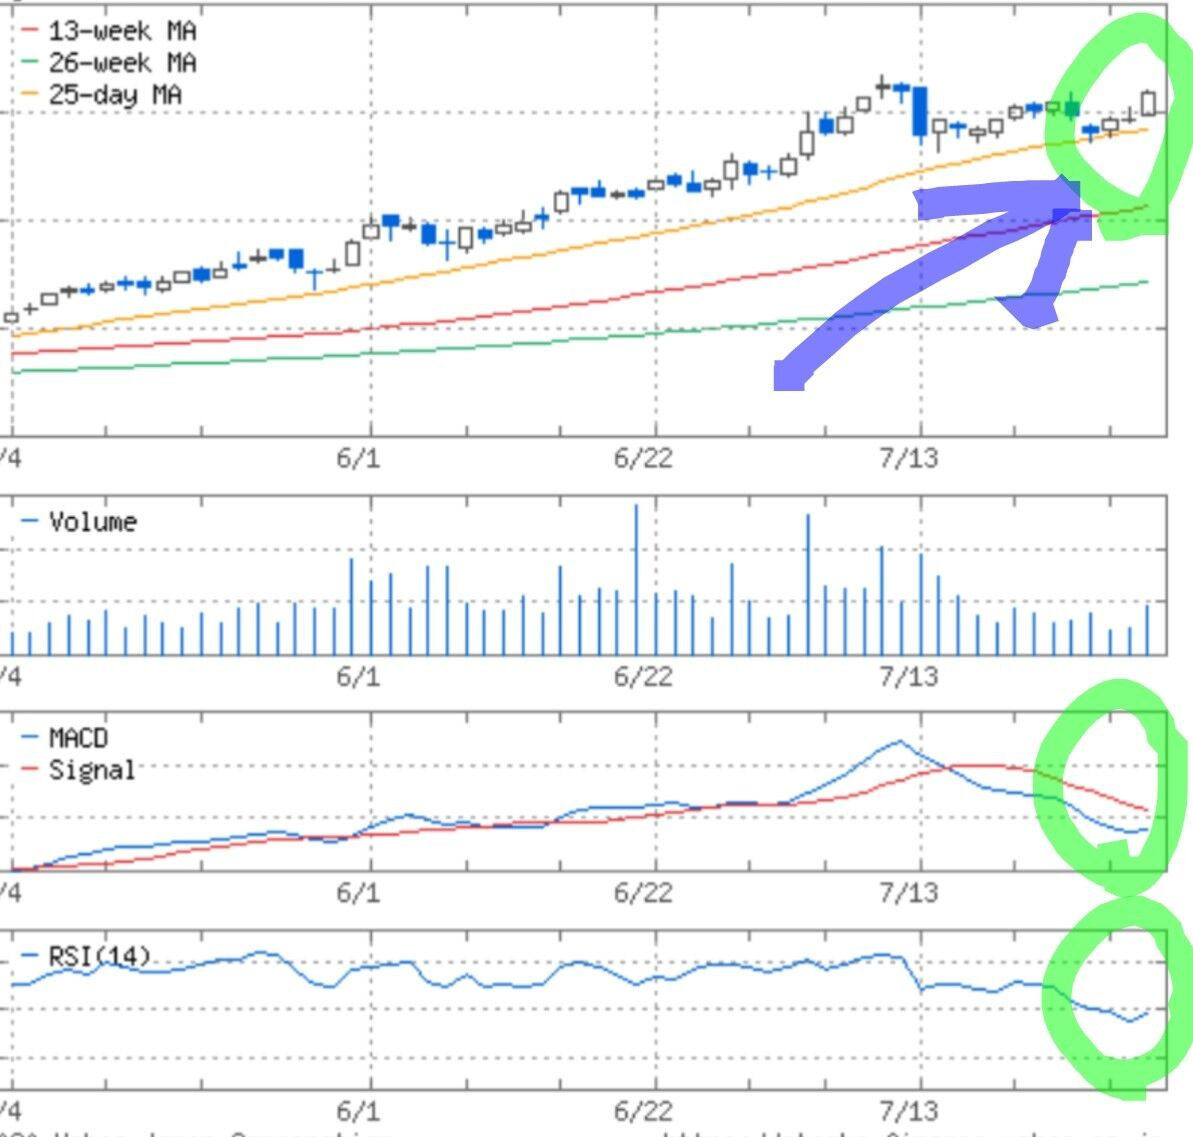 Jtb 株価 チャート